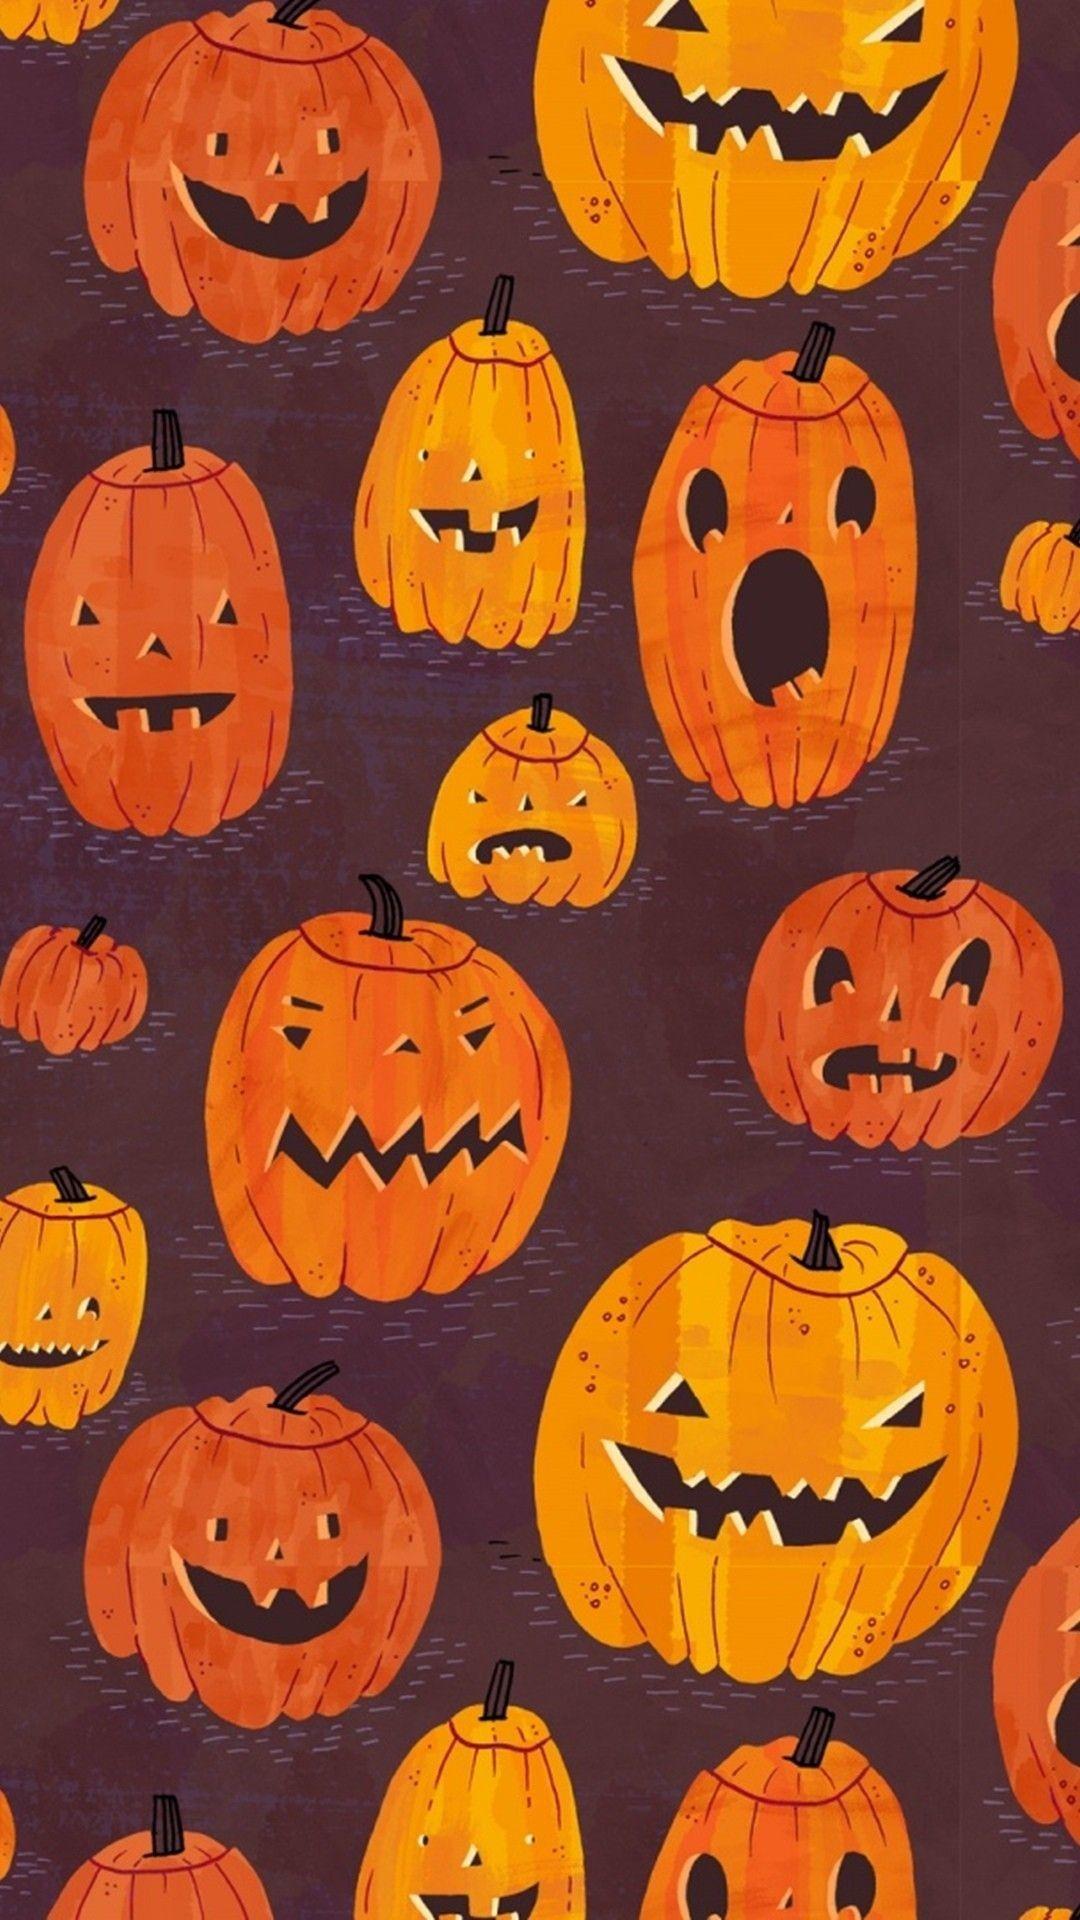 Aesthetic Halloween Wallpaper Hd Pumpkin Wallpaper Halloween Wallpaper Iphone Retro Halloween